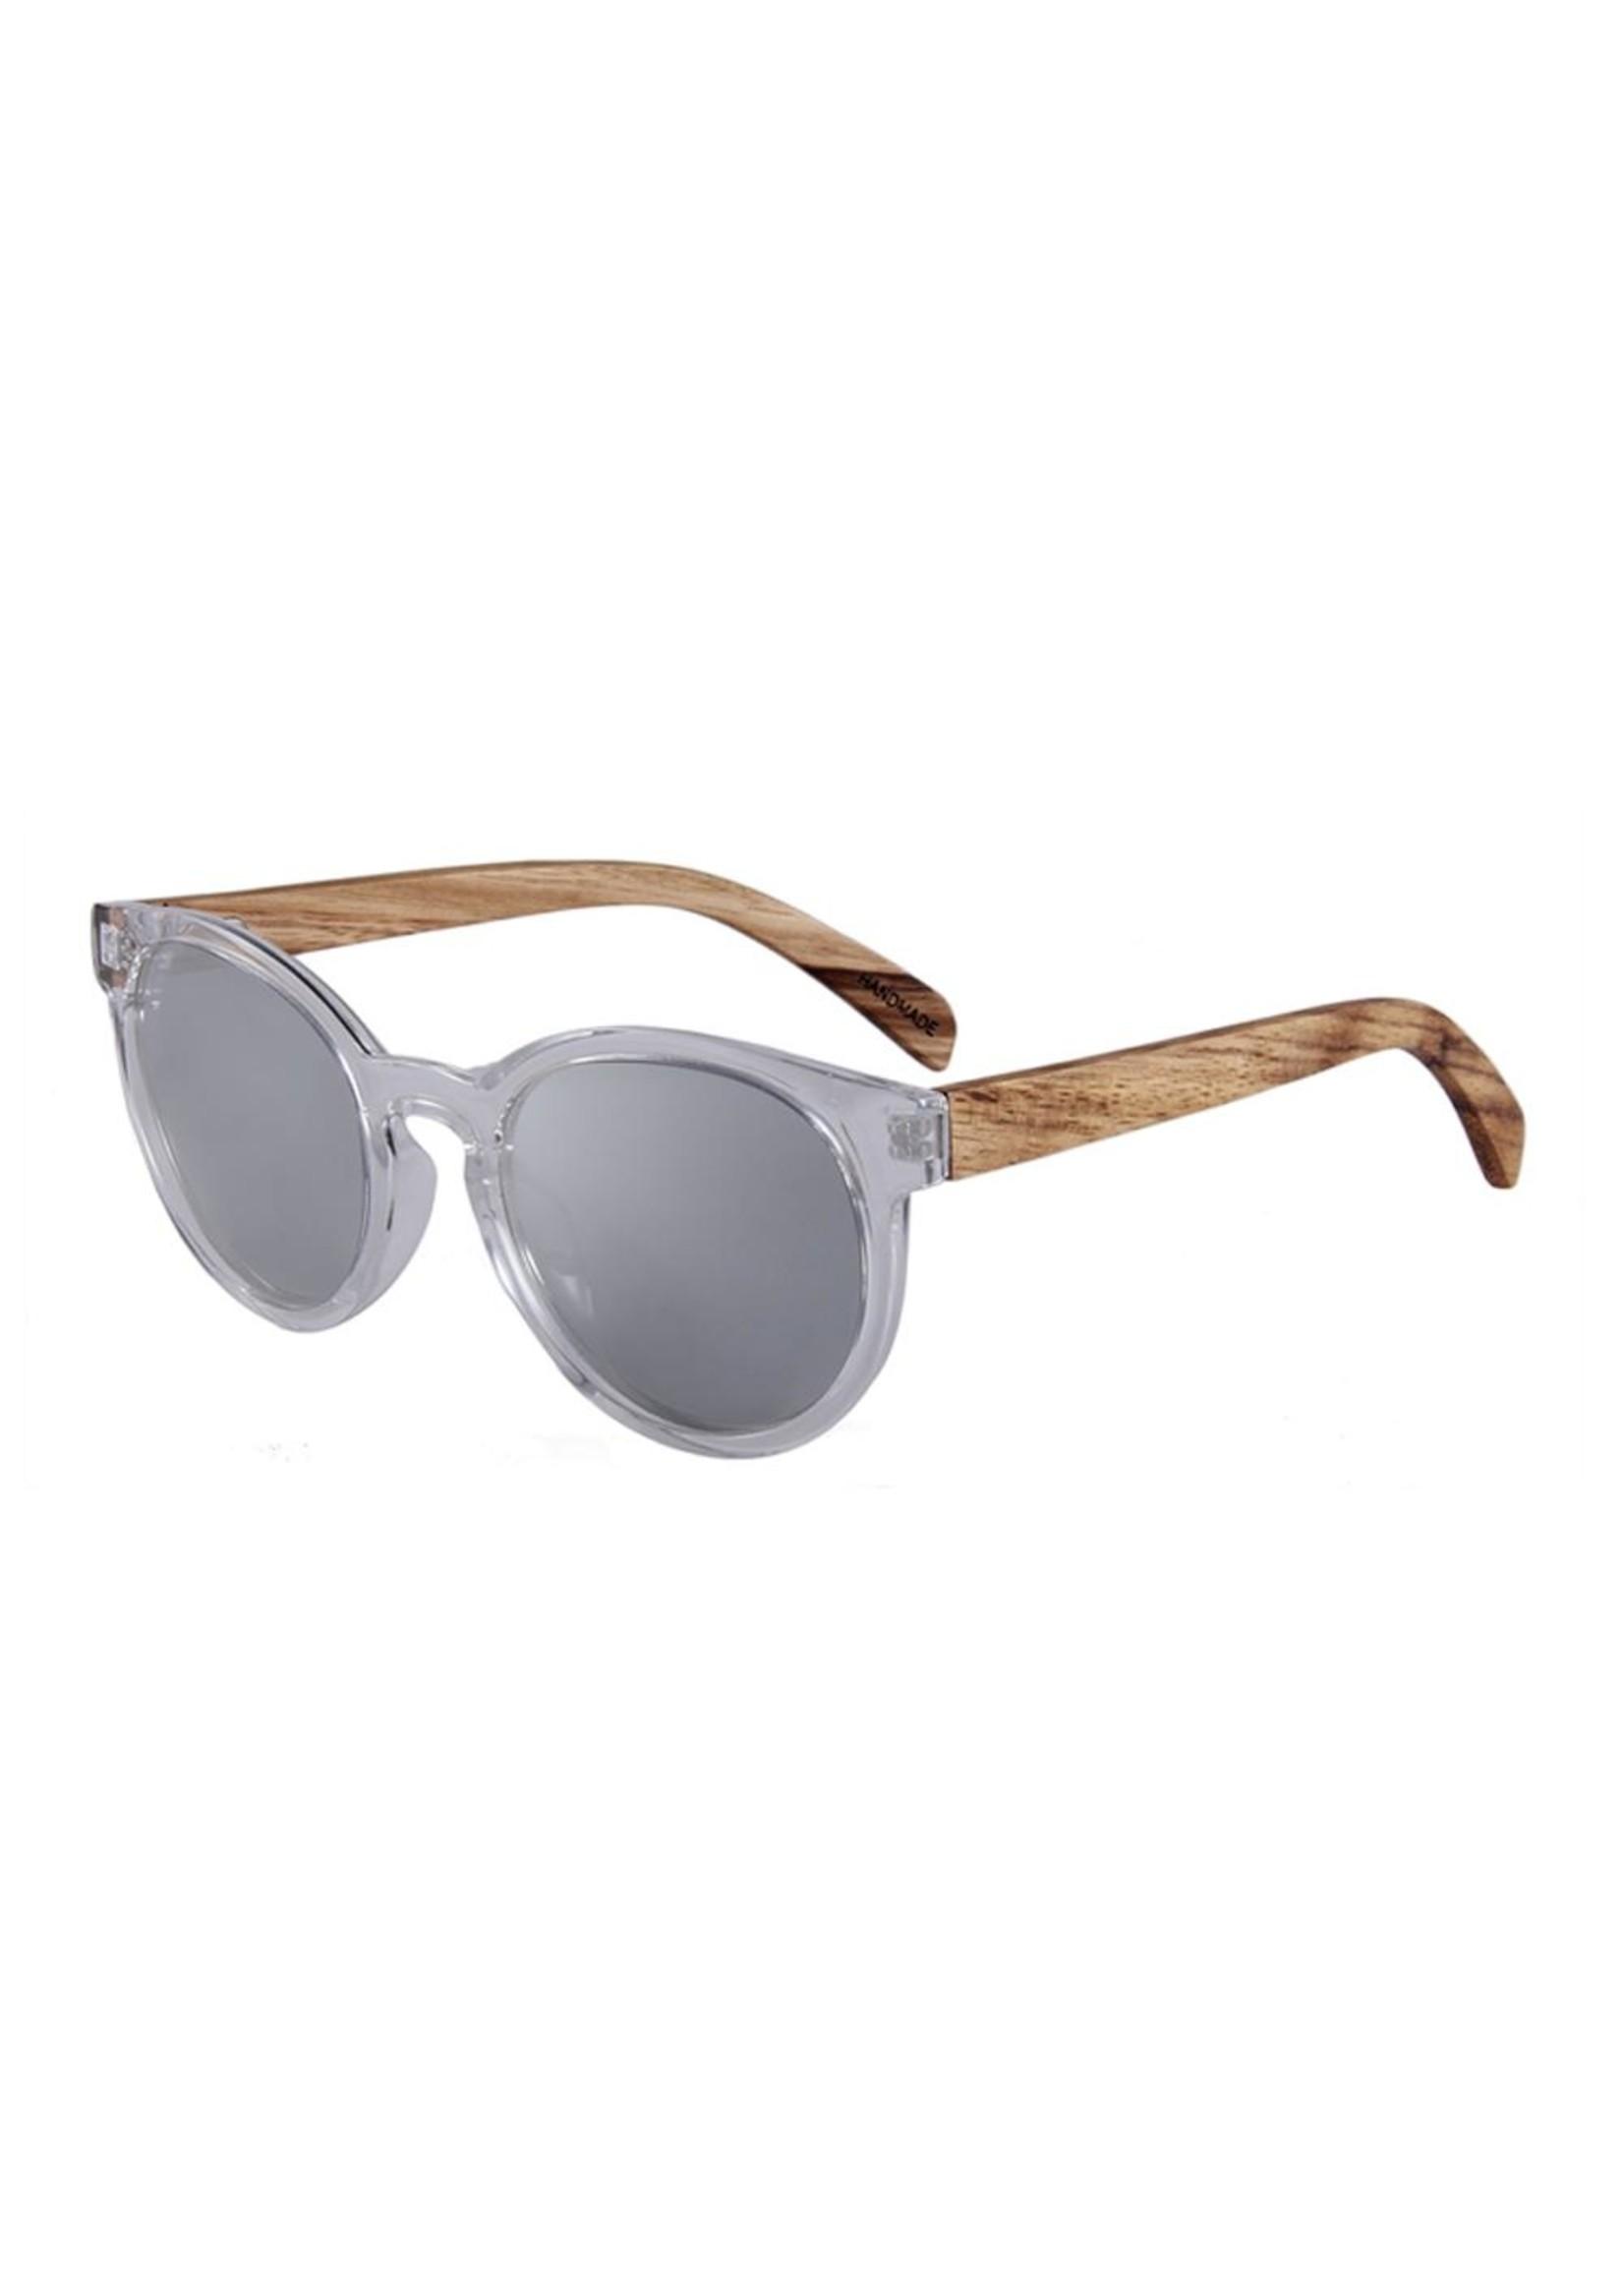 Kuma Sunglasses Iceland - Mirrored Ice